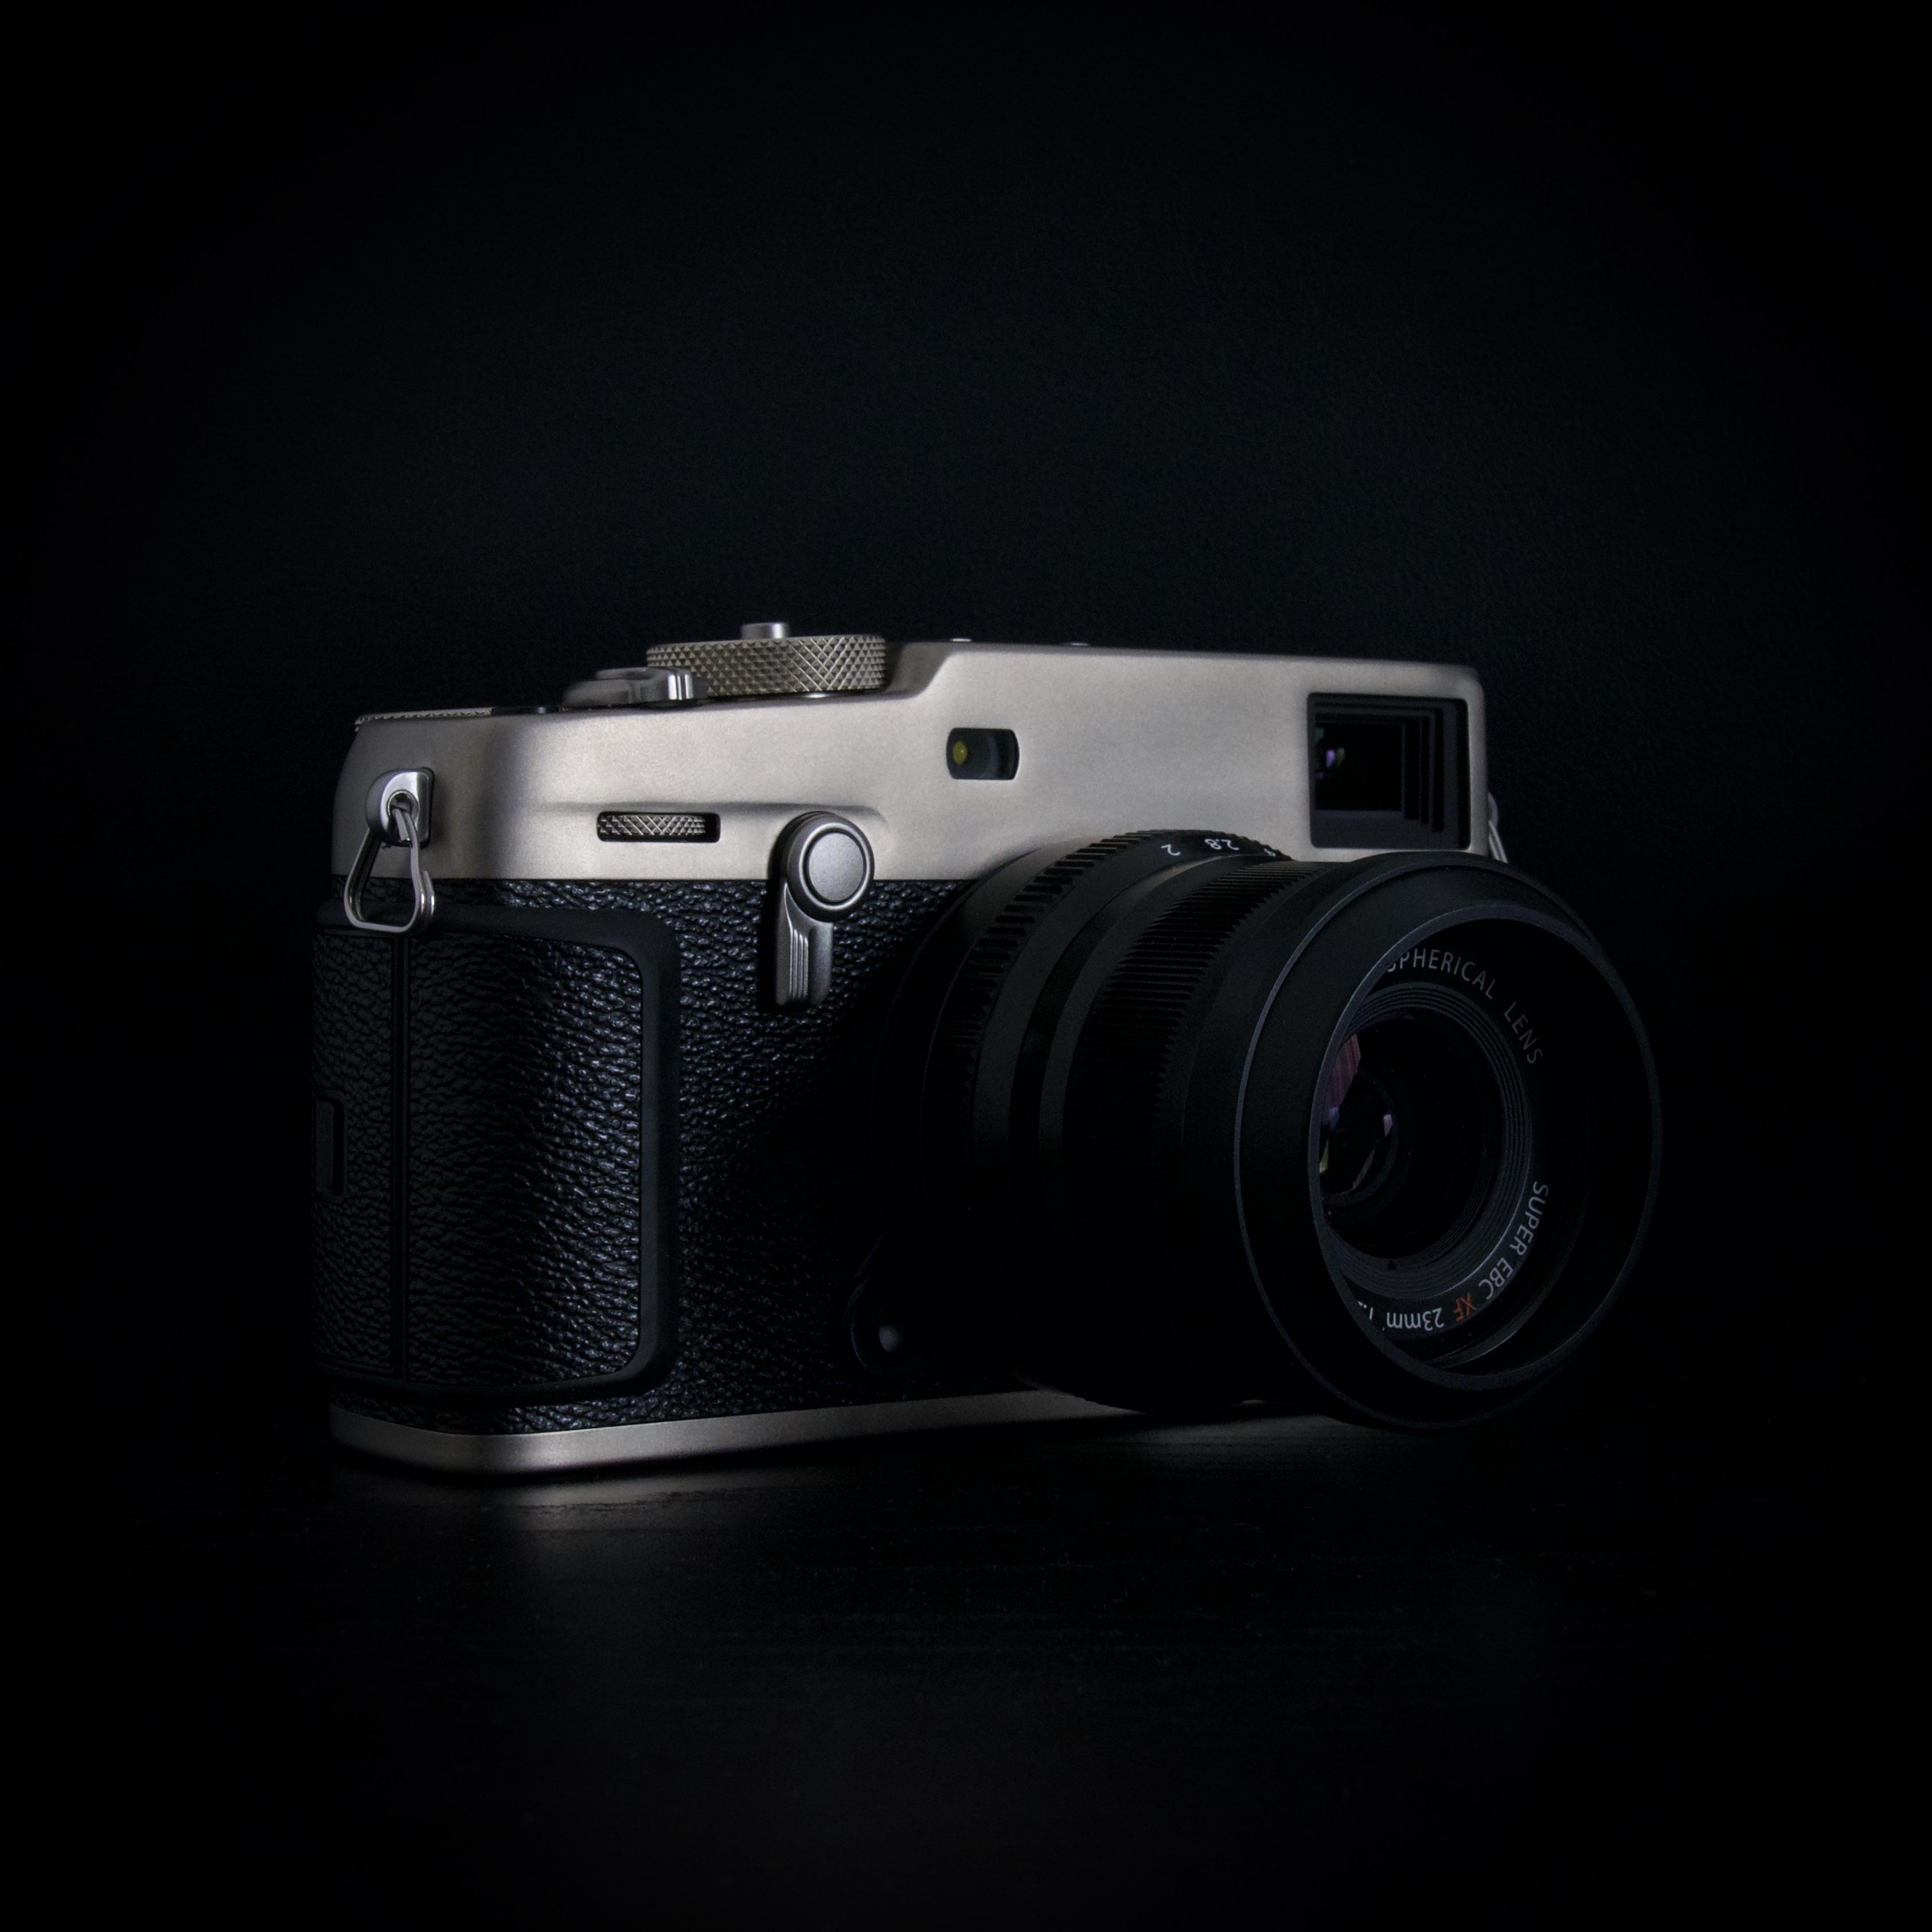 Fuji X-Pro3 review - Measuring Light